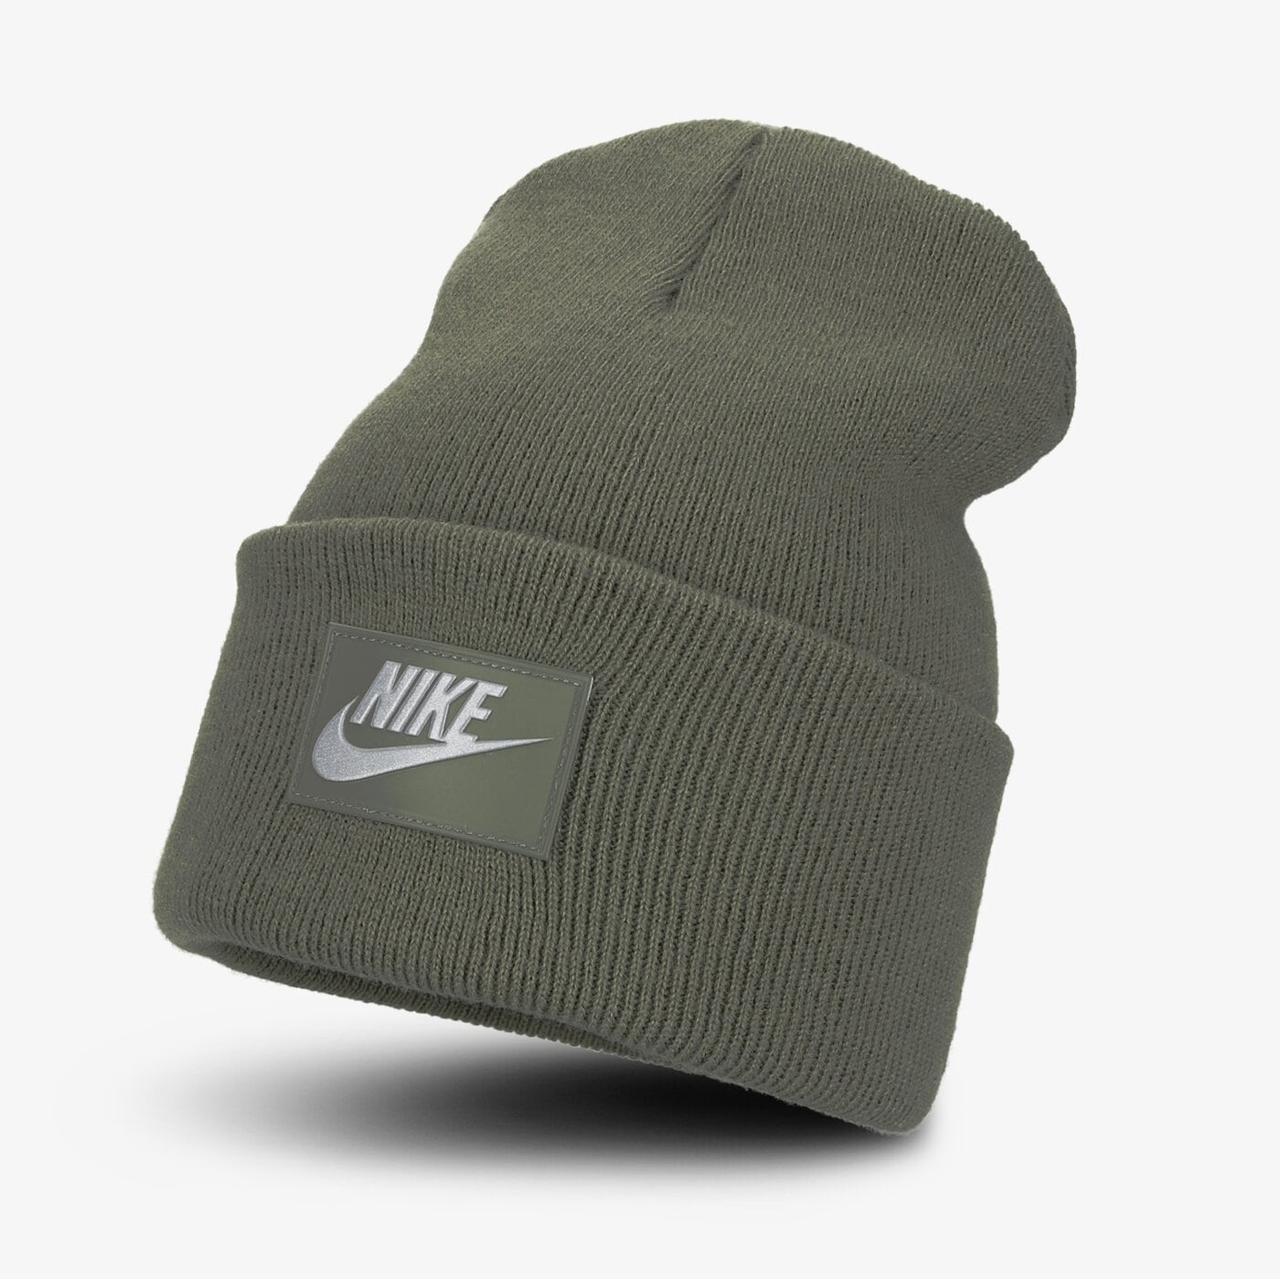 Шапка Nike NSW Cuffed Futura Beanie DA2021-380 Оливковый